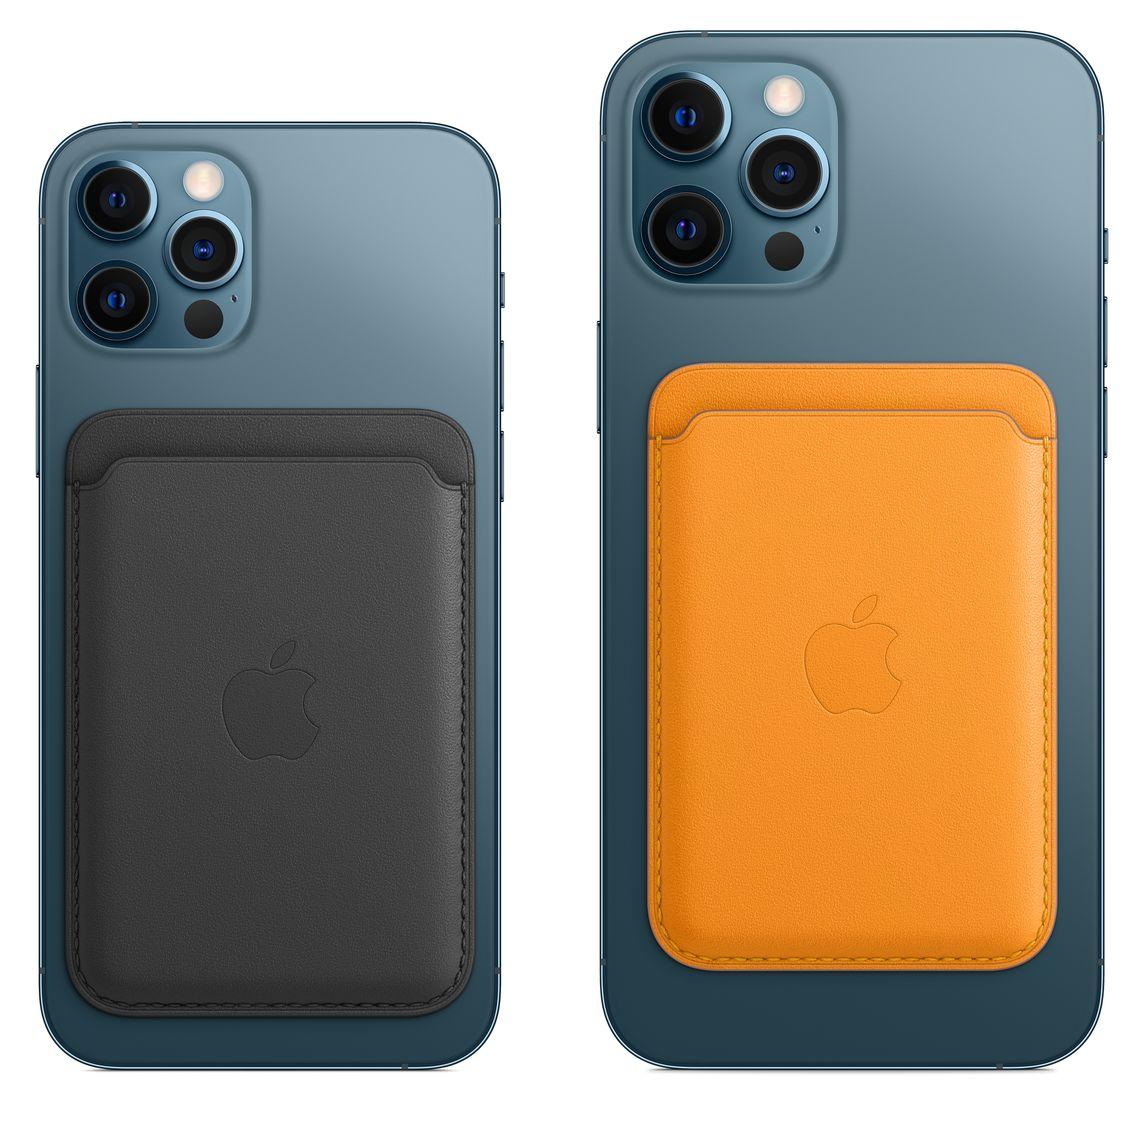 iPhone Leder Wallet mit MagSafe - Sattelbraun - Business - Apple (AT)